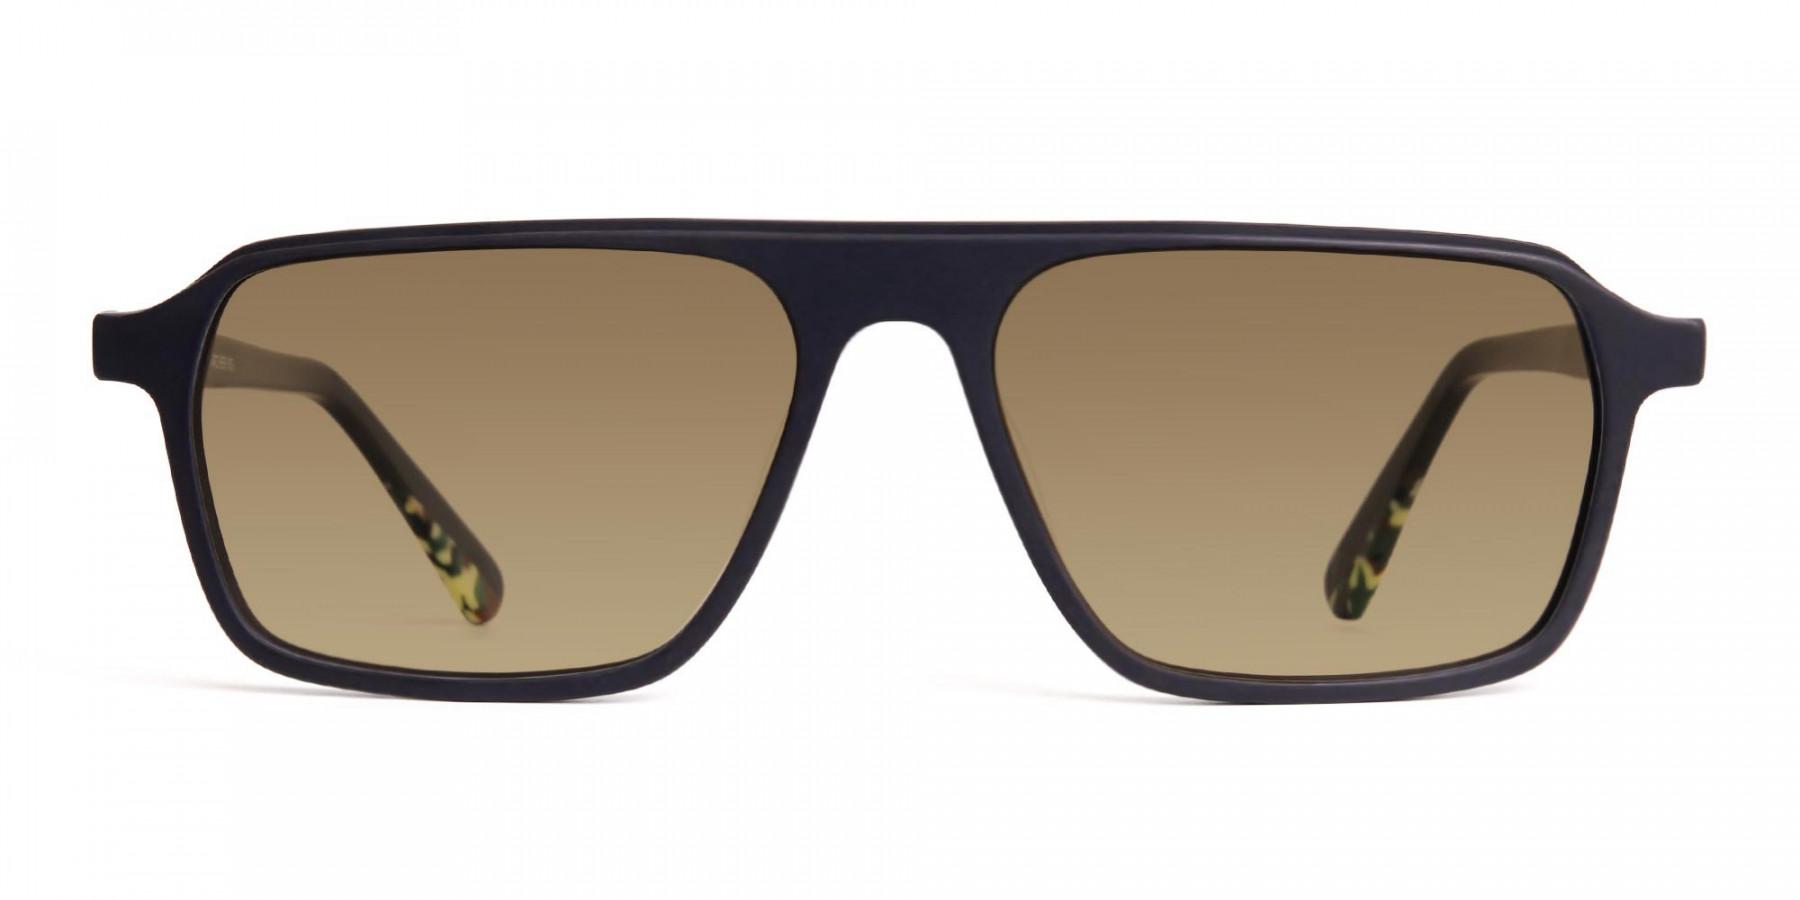 matte-grey-rectangular-full-rim-brown-tinted-sunglasses-frames-3